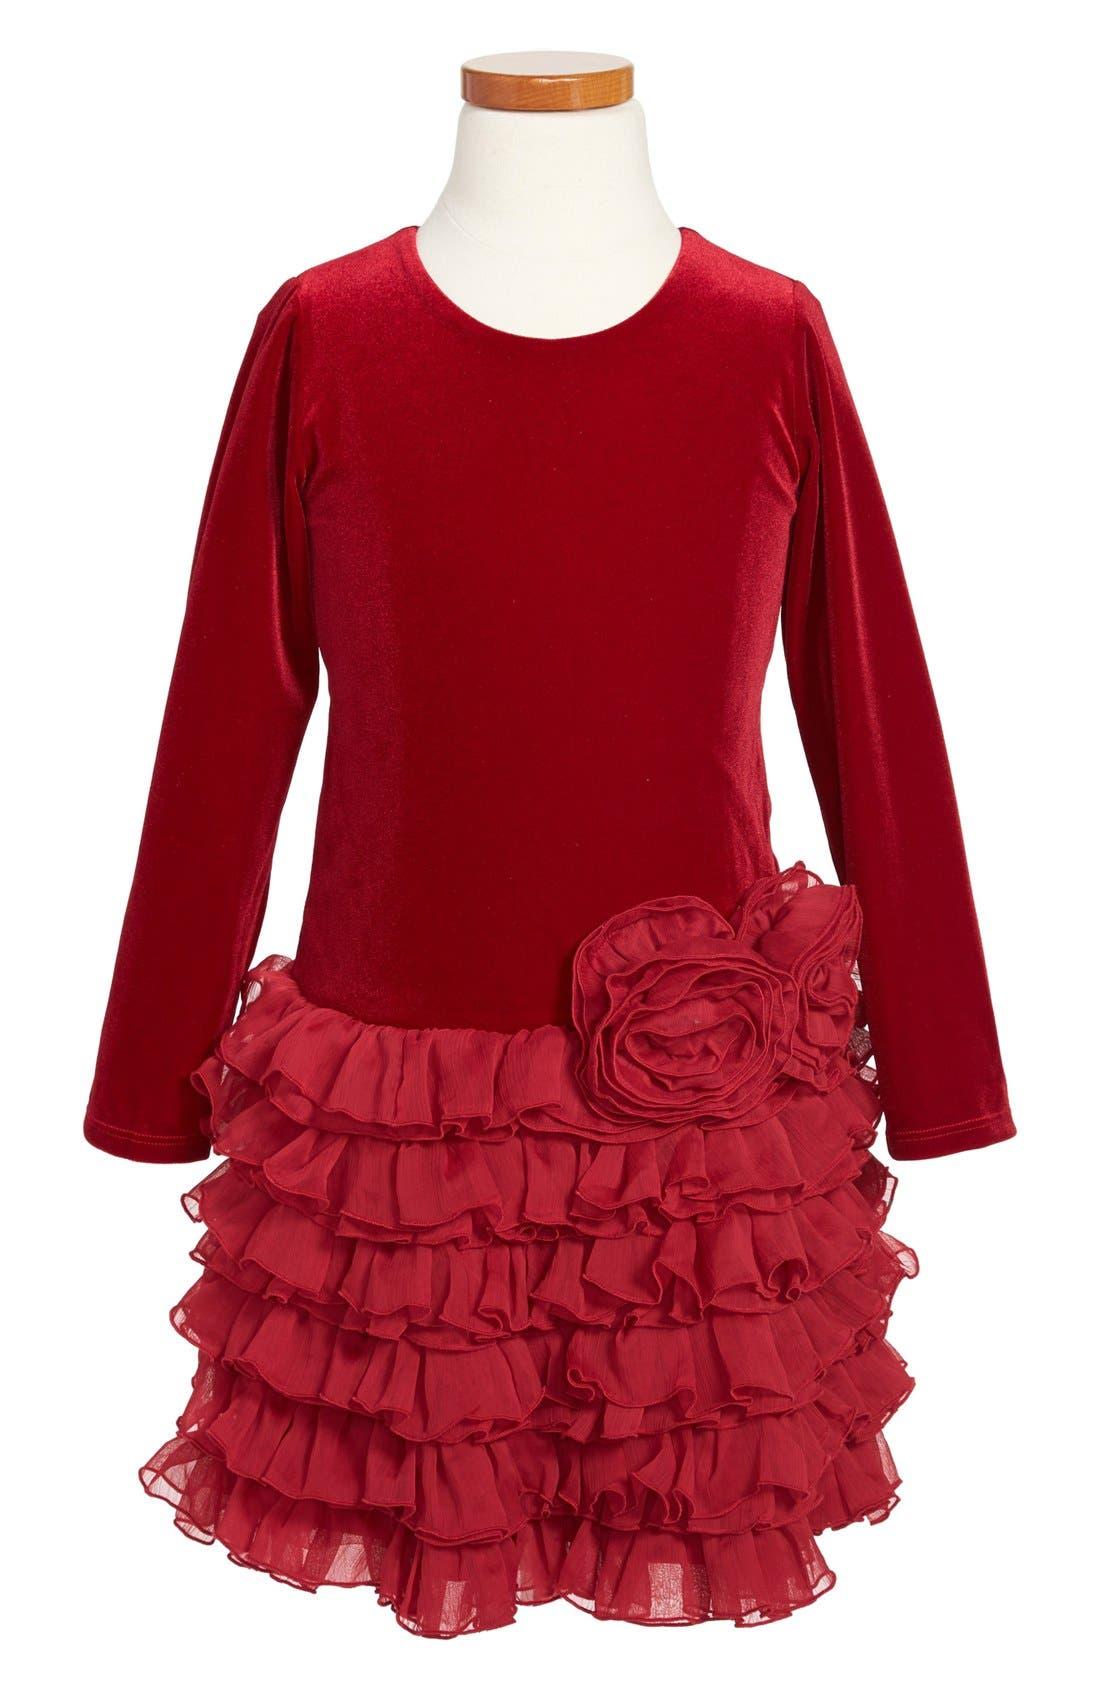 Alternate Image 1 Selected - Isobella & Chloe Drop Waist Ruffle Dress (Little Girls & Big Girls)